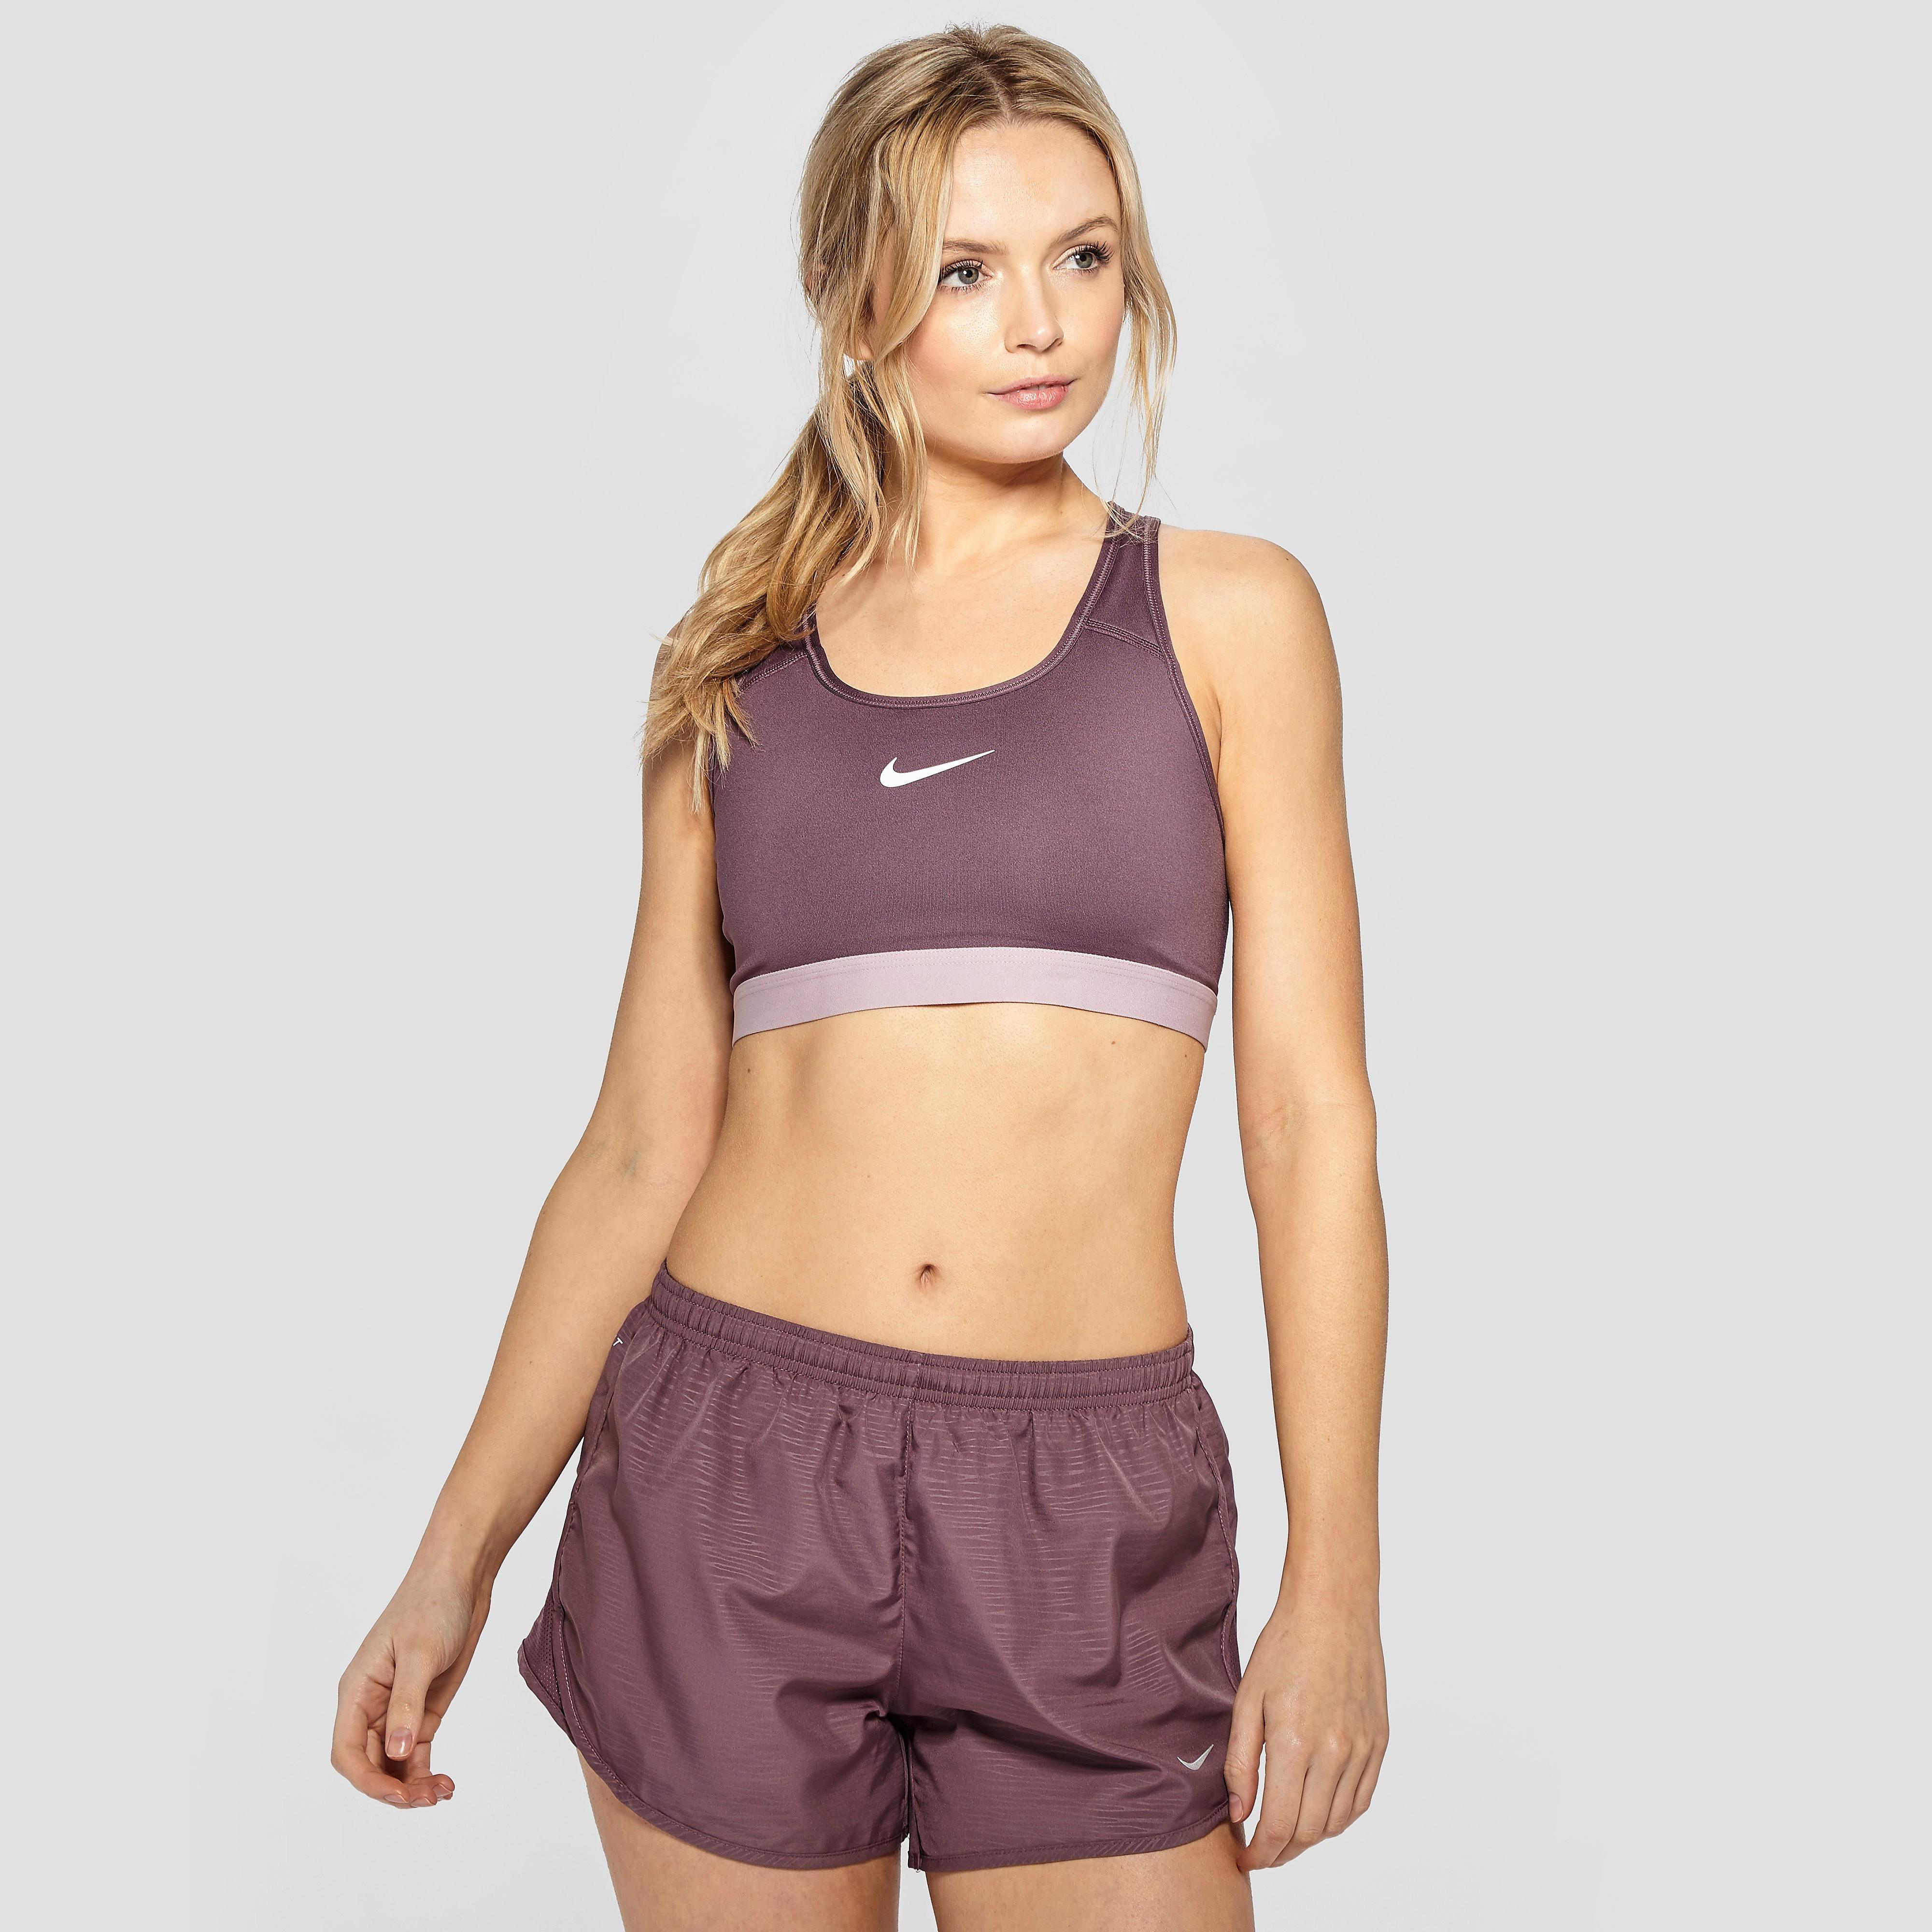 Nike Pro Classis Padded Women's Sports Bra